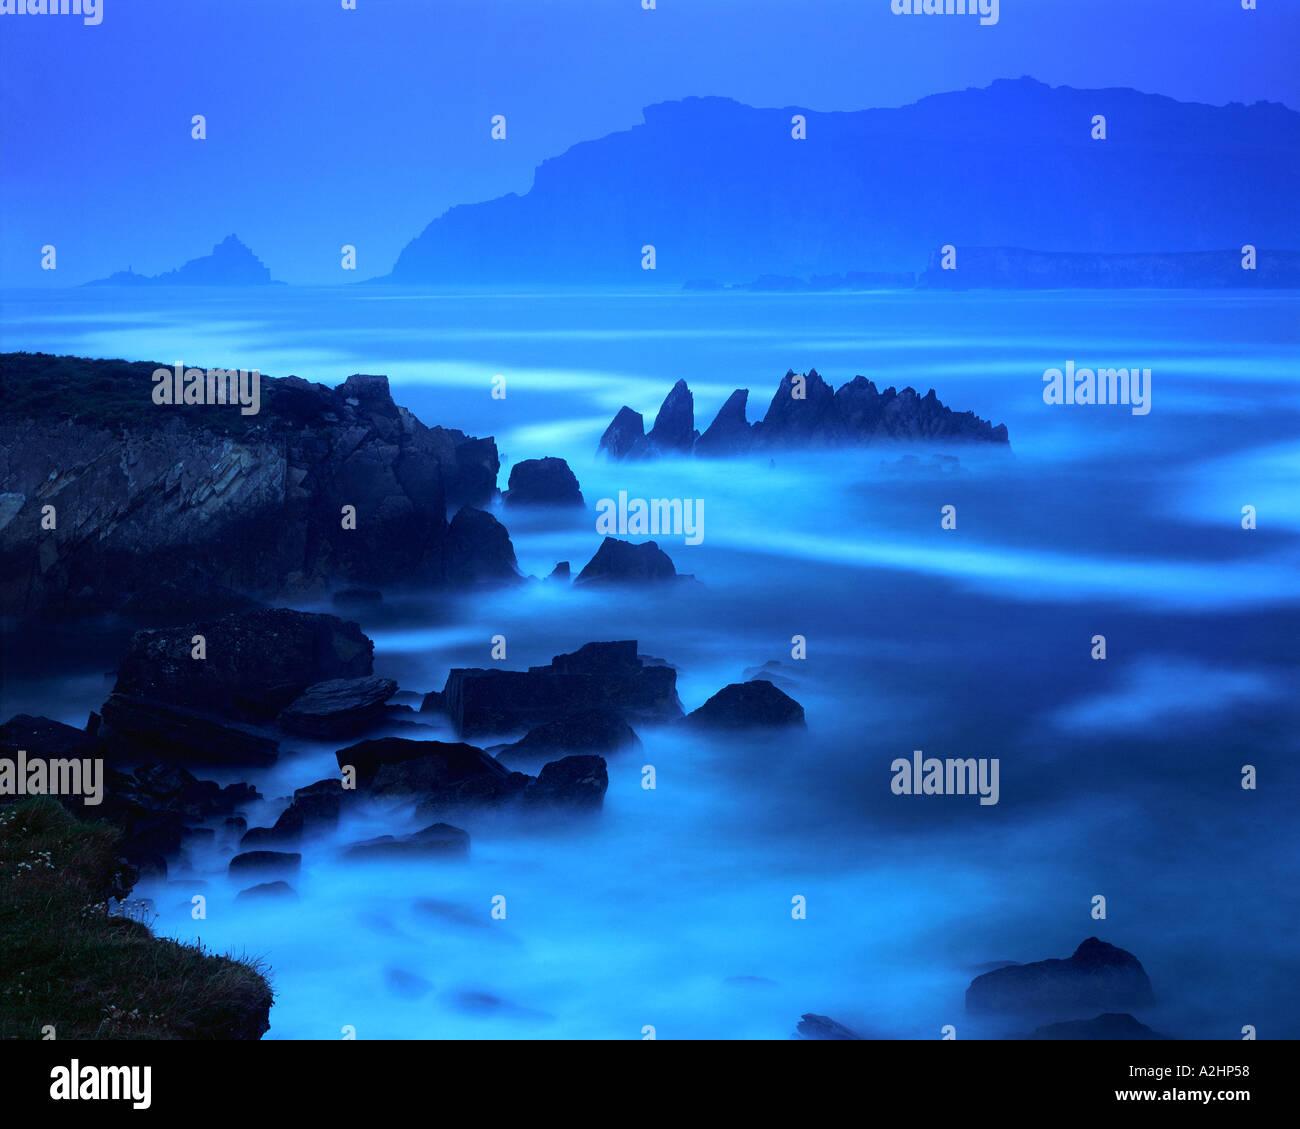 IE - comté de Kerry: Ballyferriter Bay Photo Stock